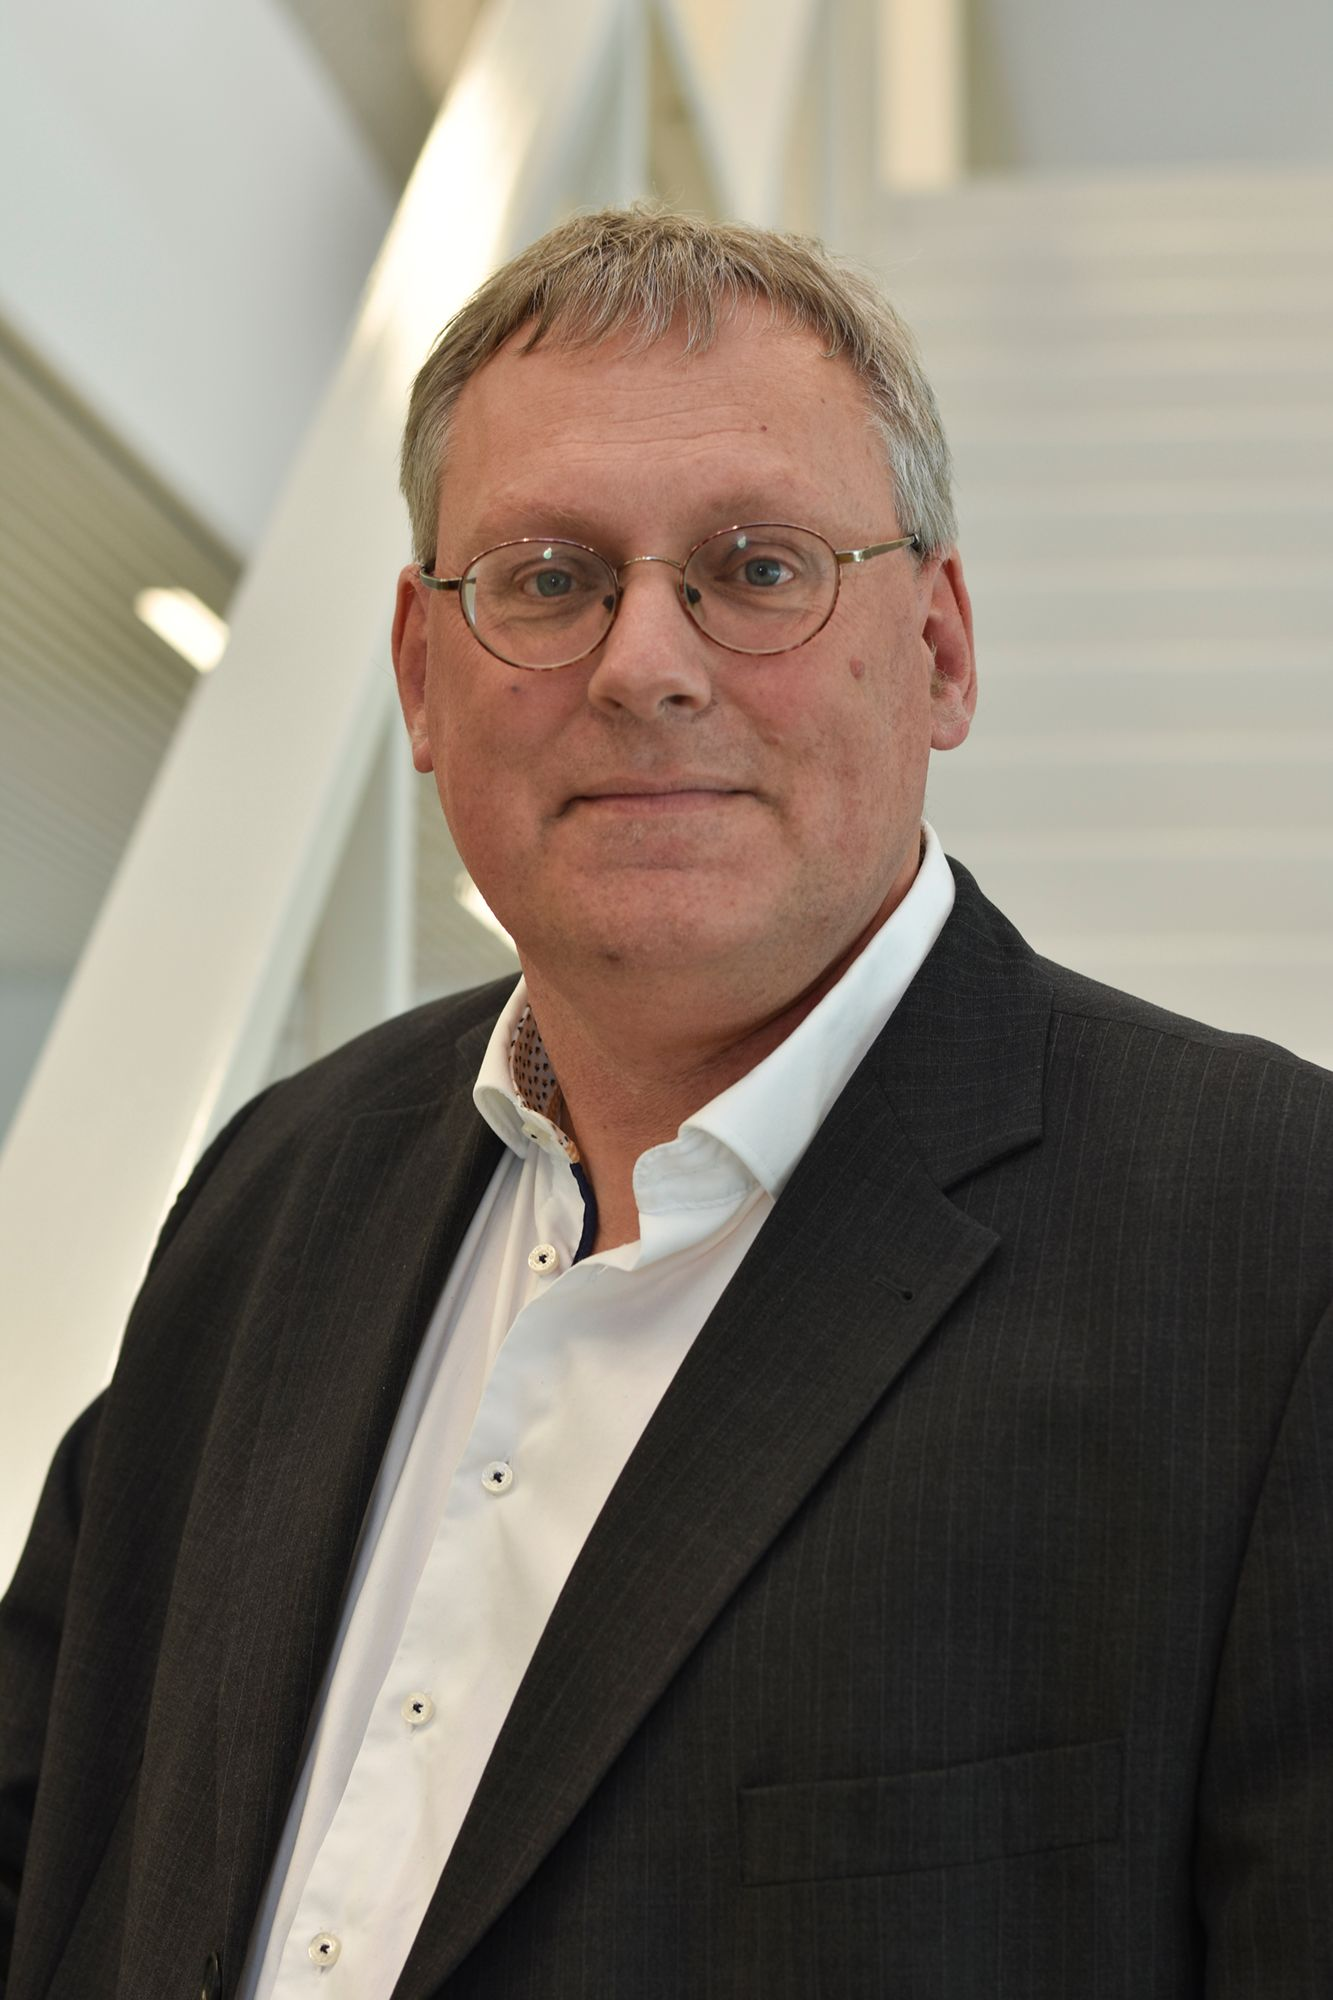 Gerrit Jan Schaeffer